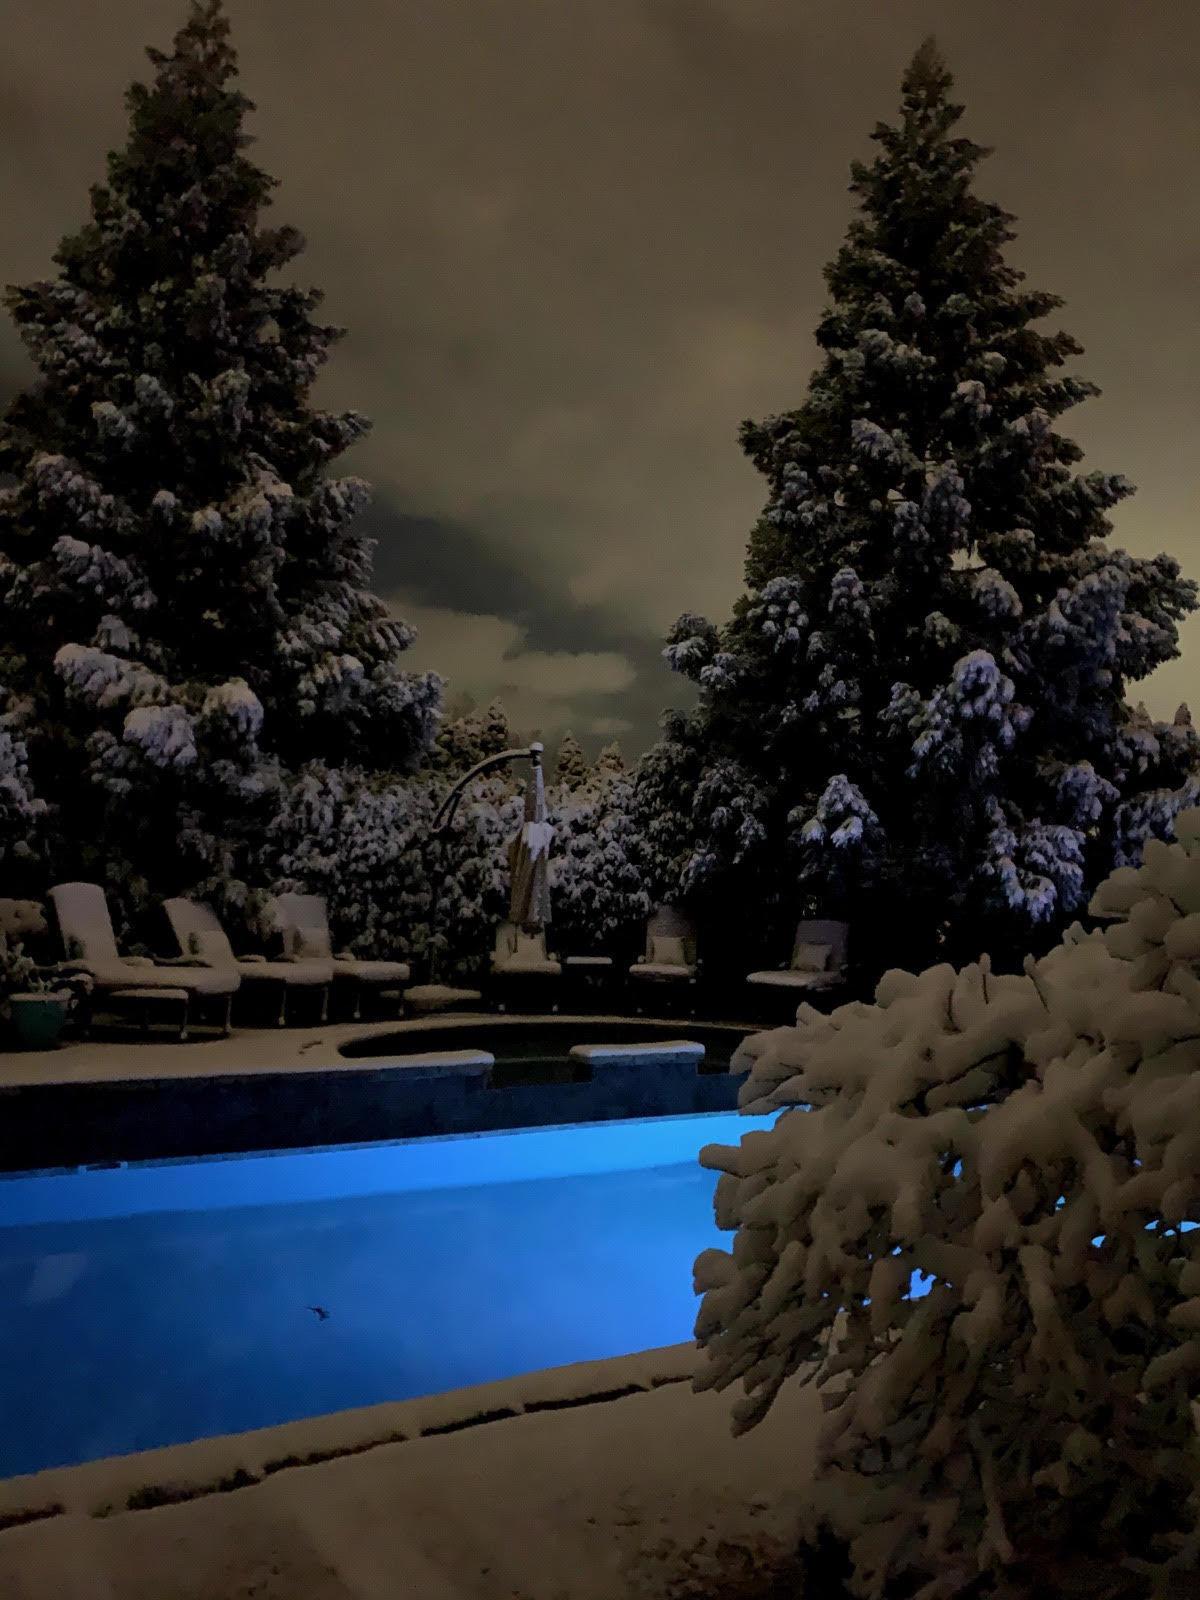 Winter Pool Scene